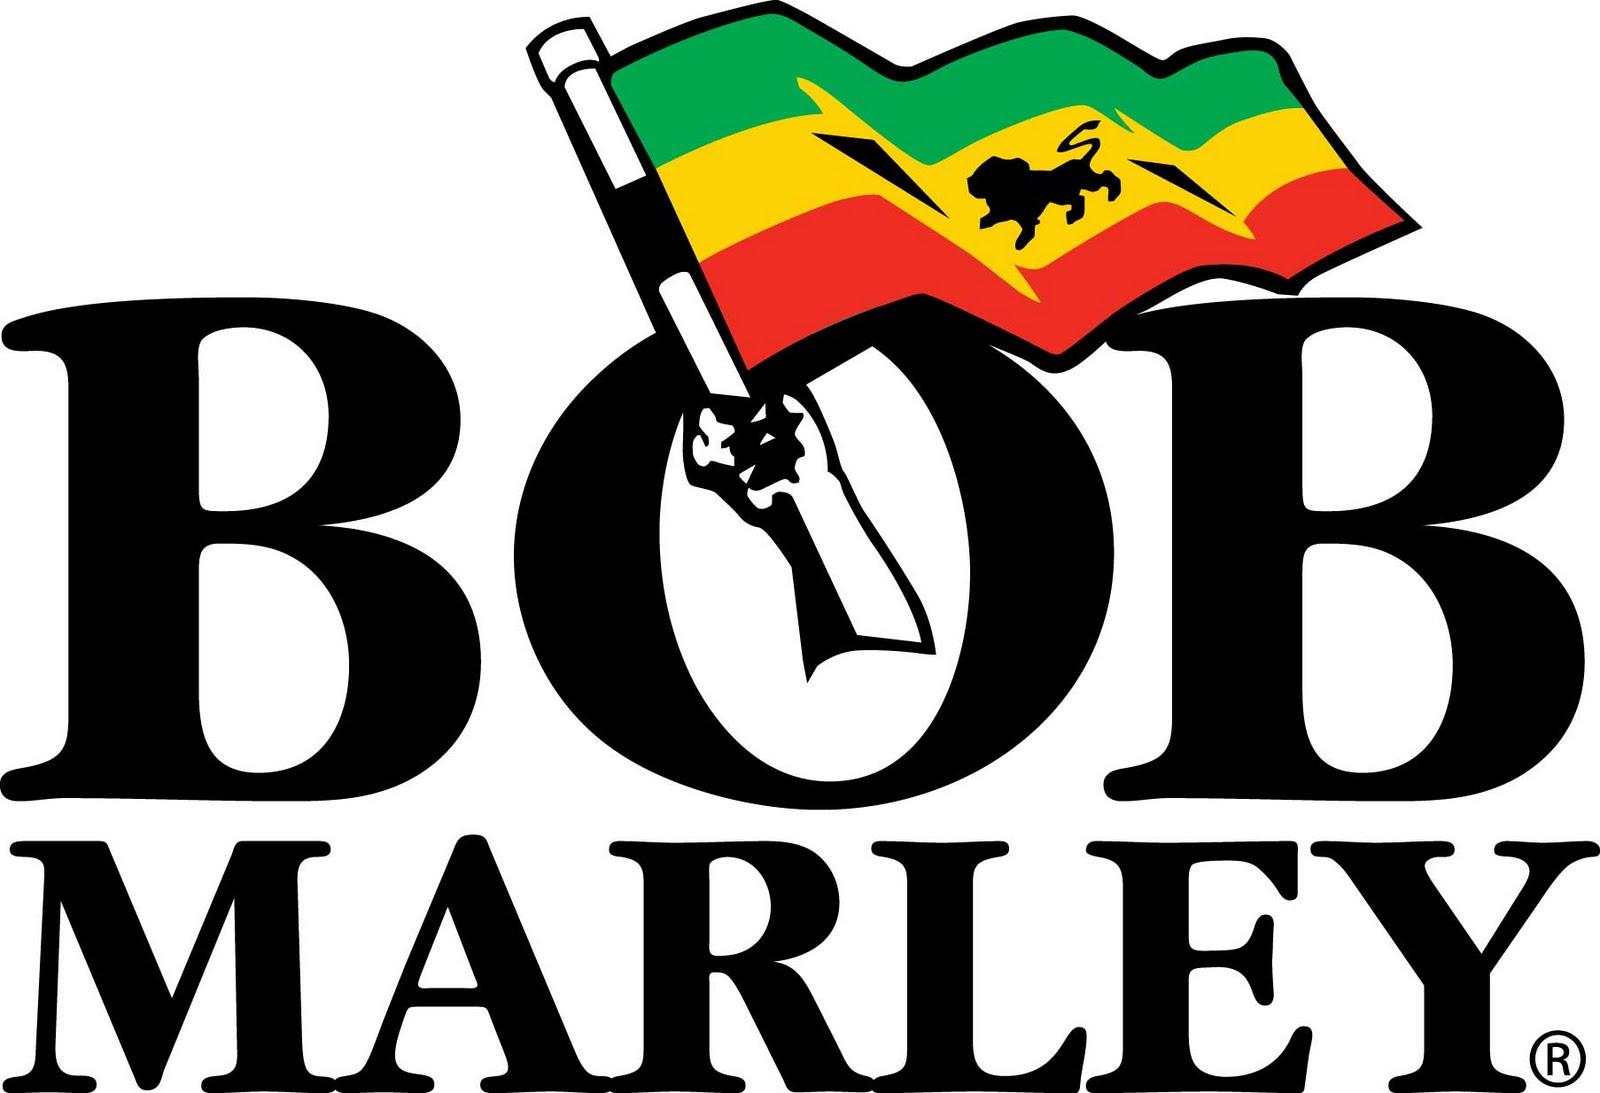 Bob marley Logos